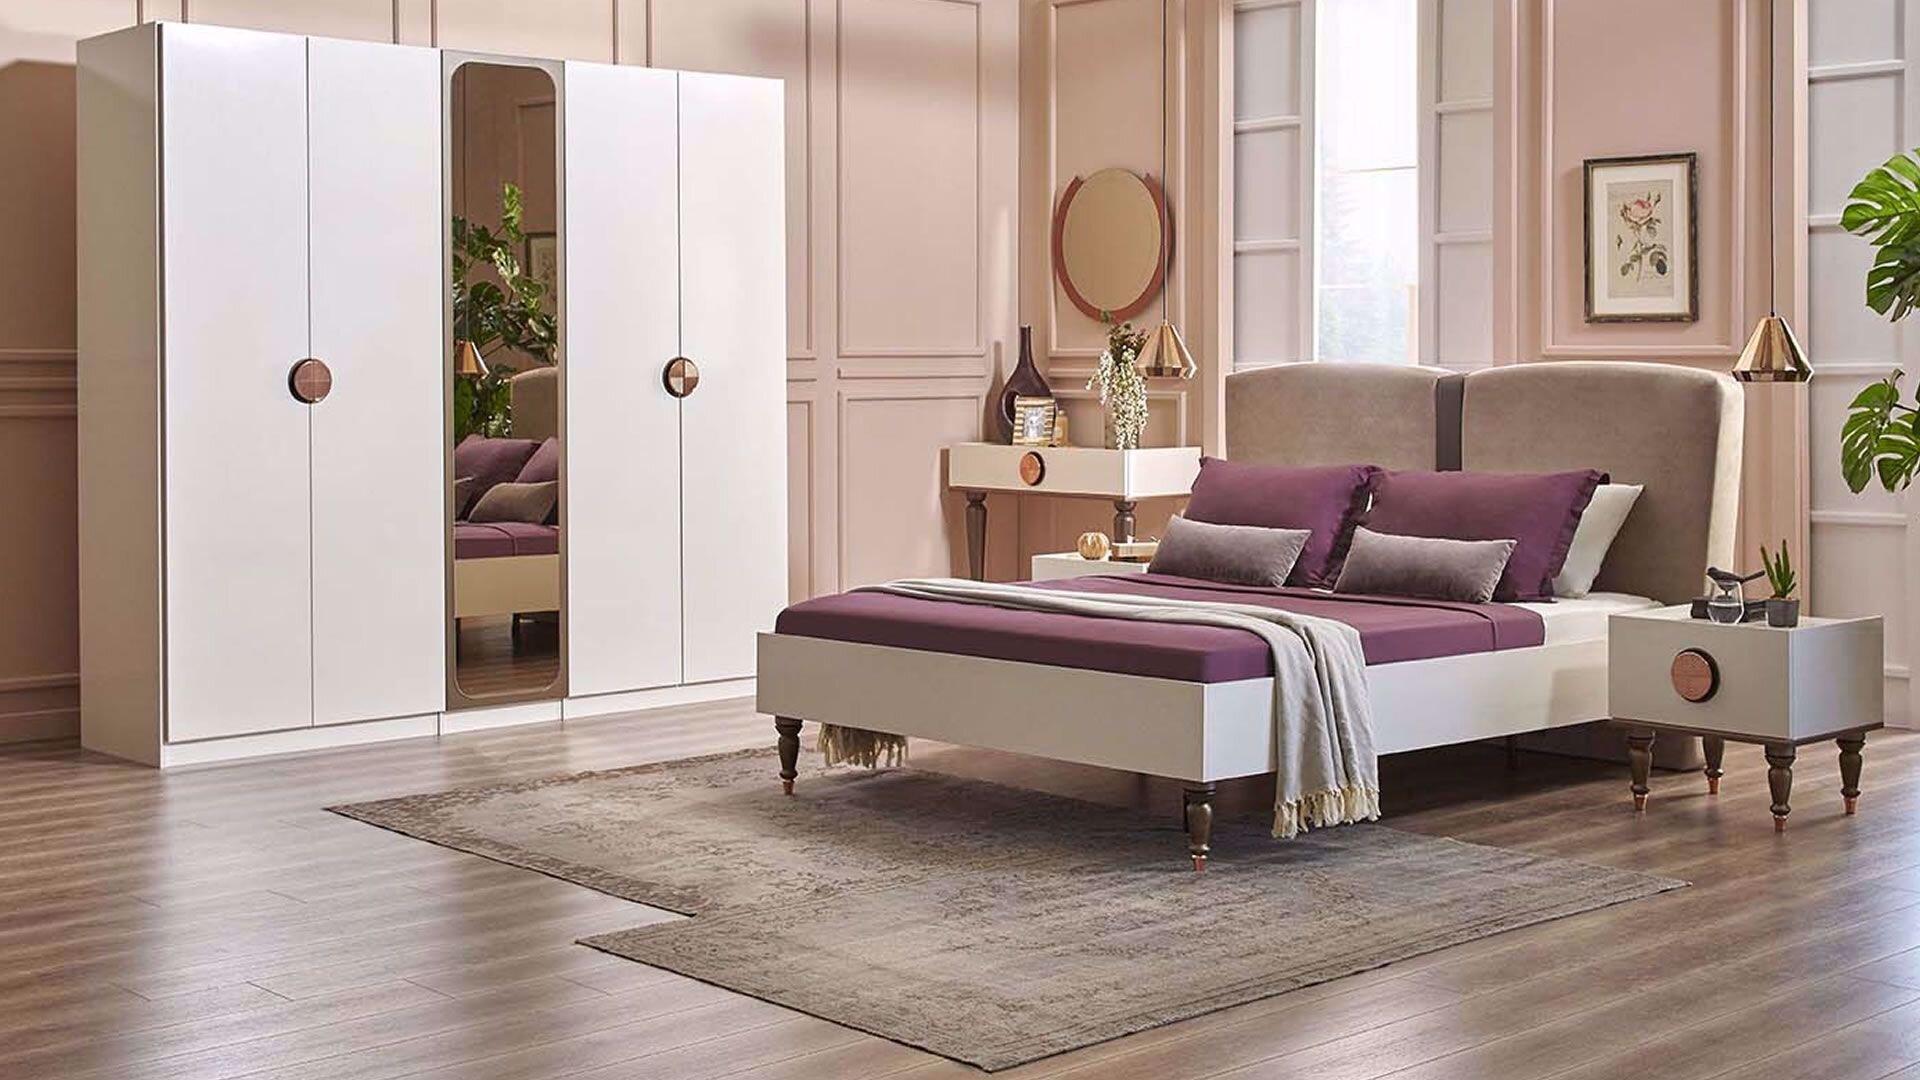 Levana 5 Doors Wardrobe (230 cm)